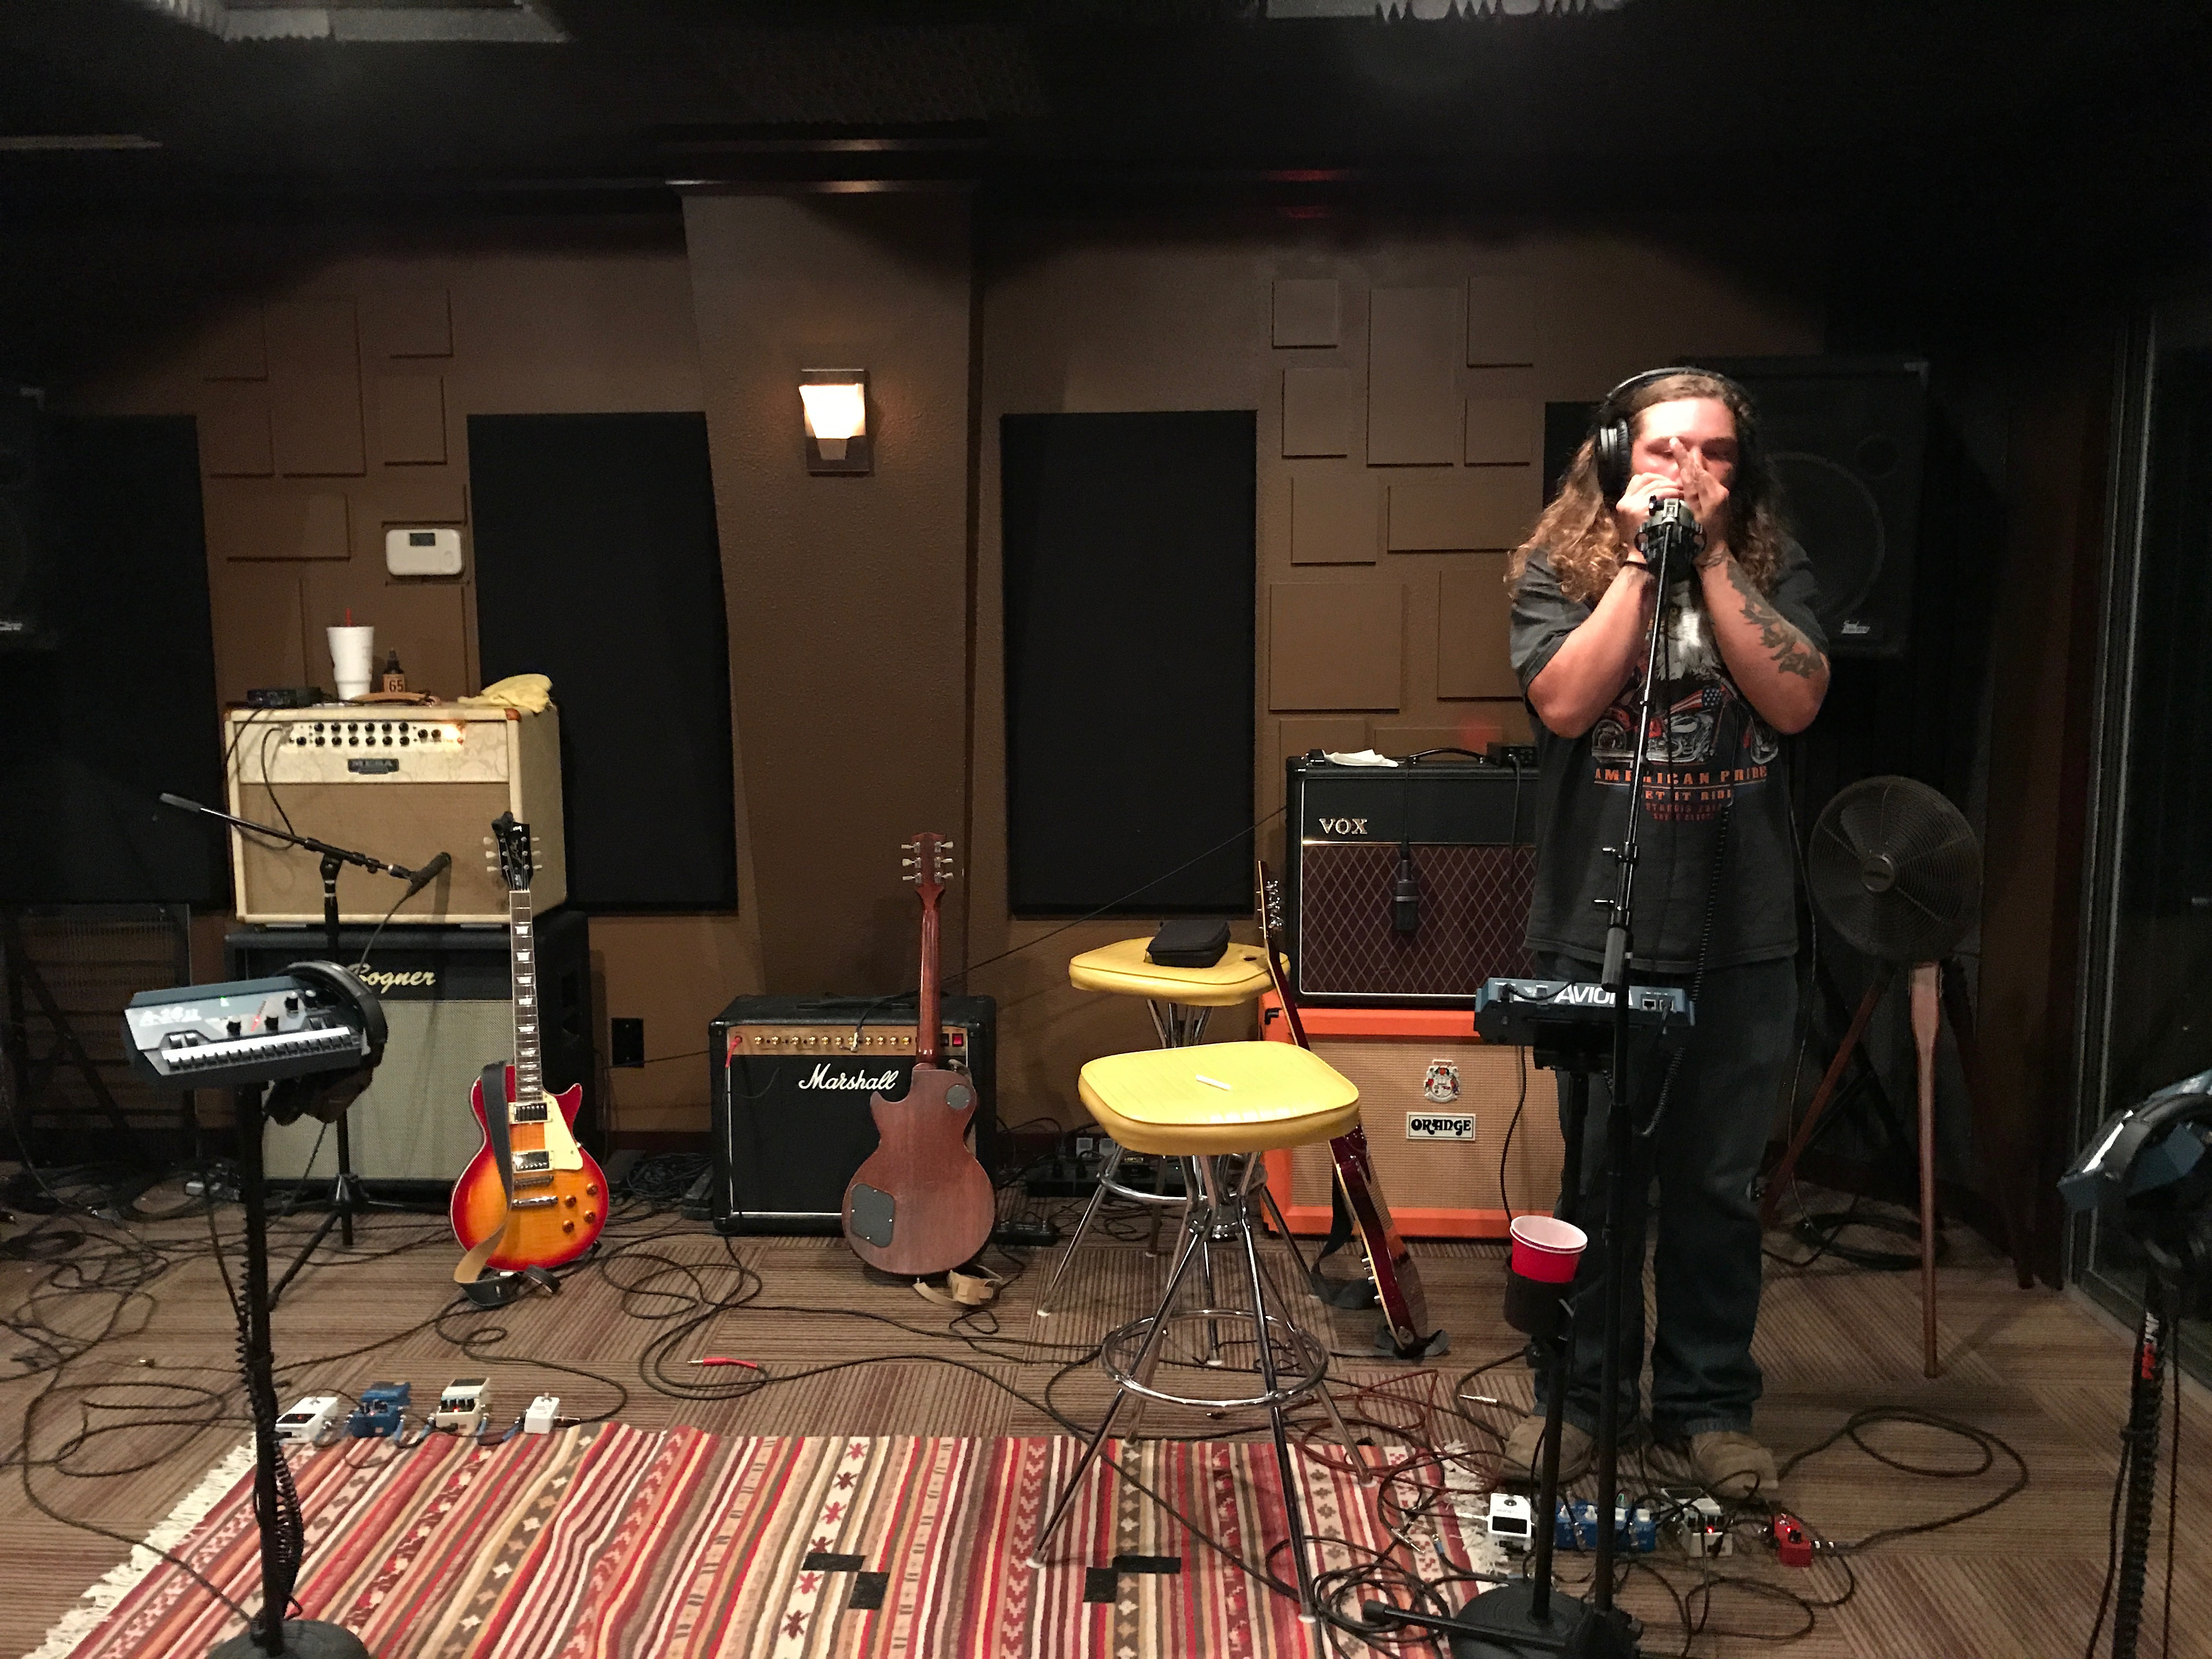 Justin Harmonica